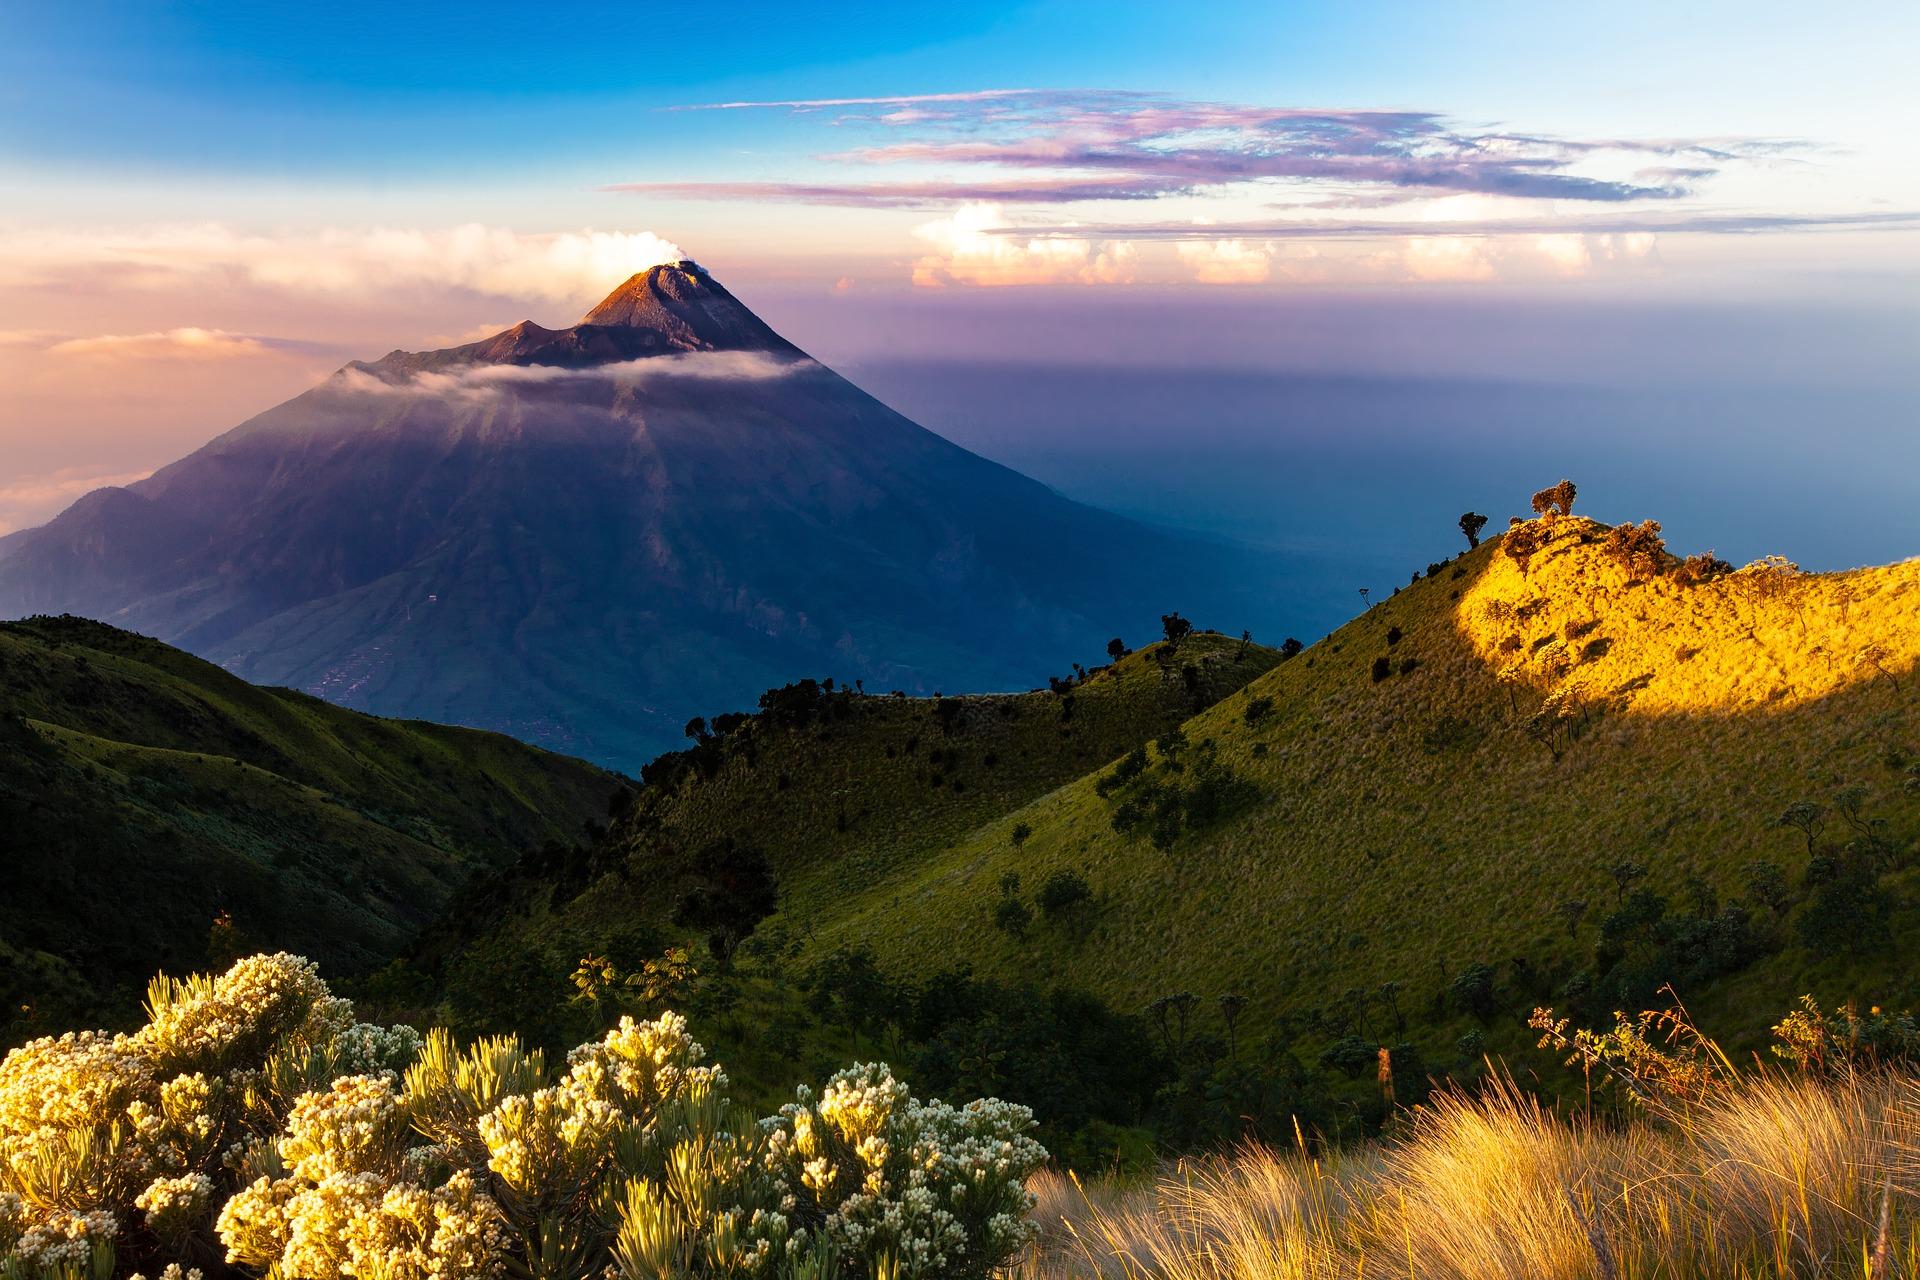 Circuit Indonezia - Inima exotica a Asiei